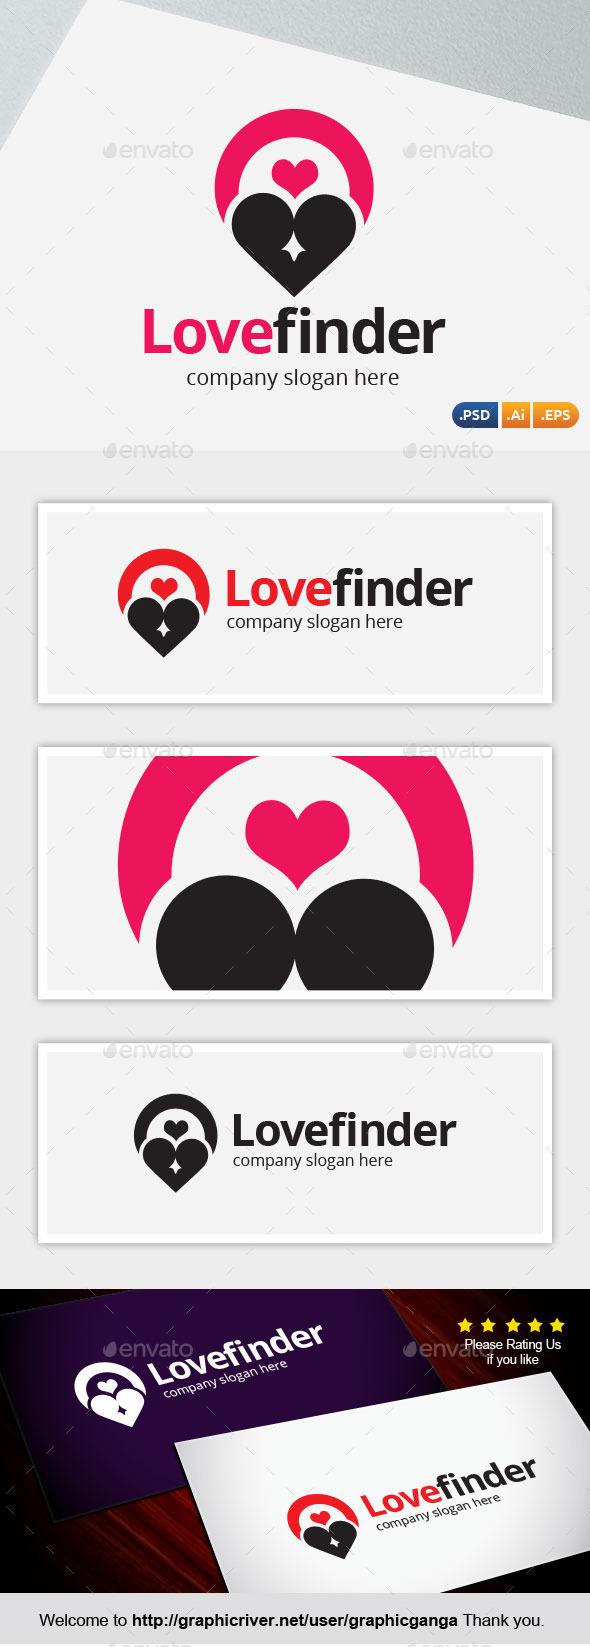 GraphicRiver Love Finder 9599299